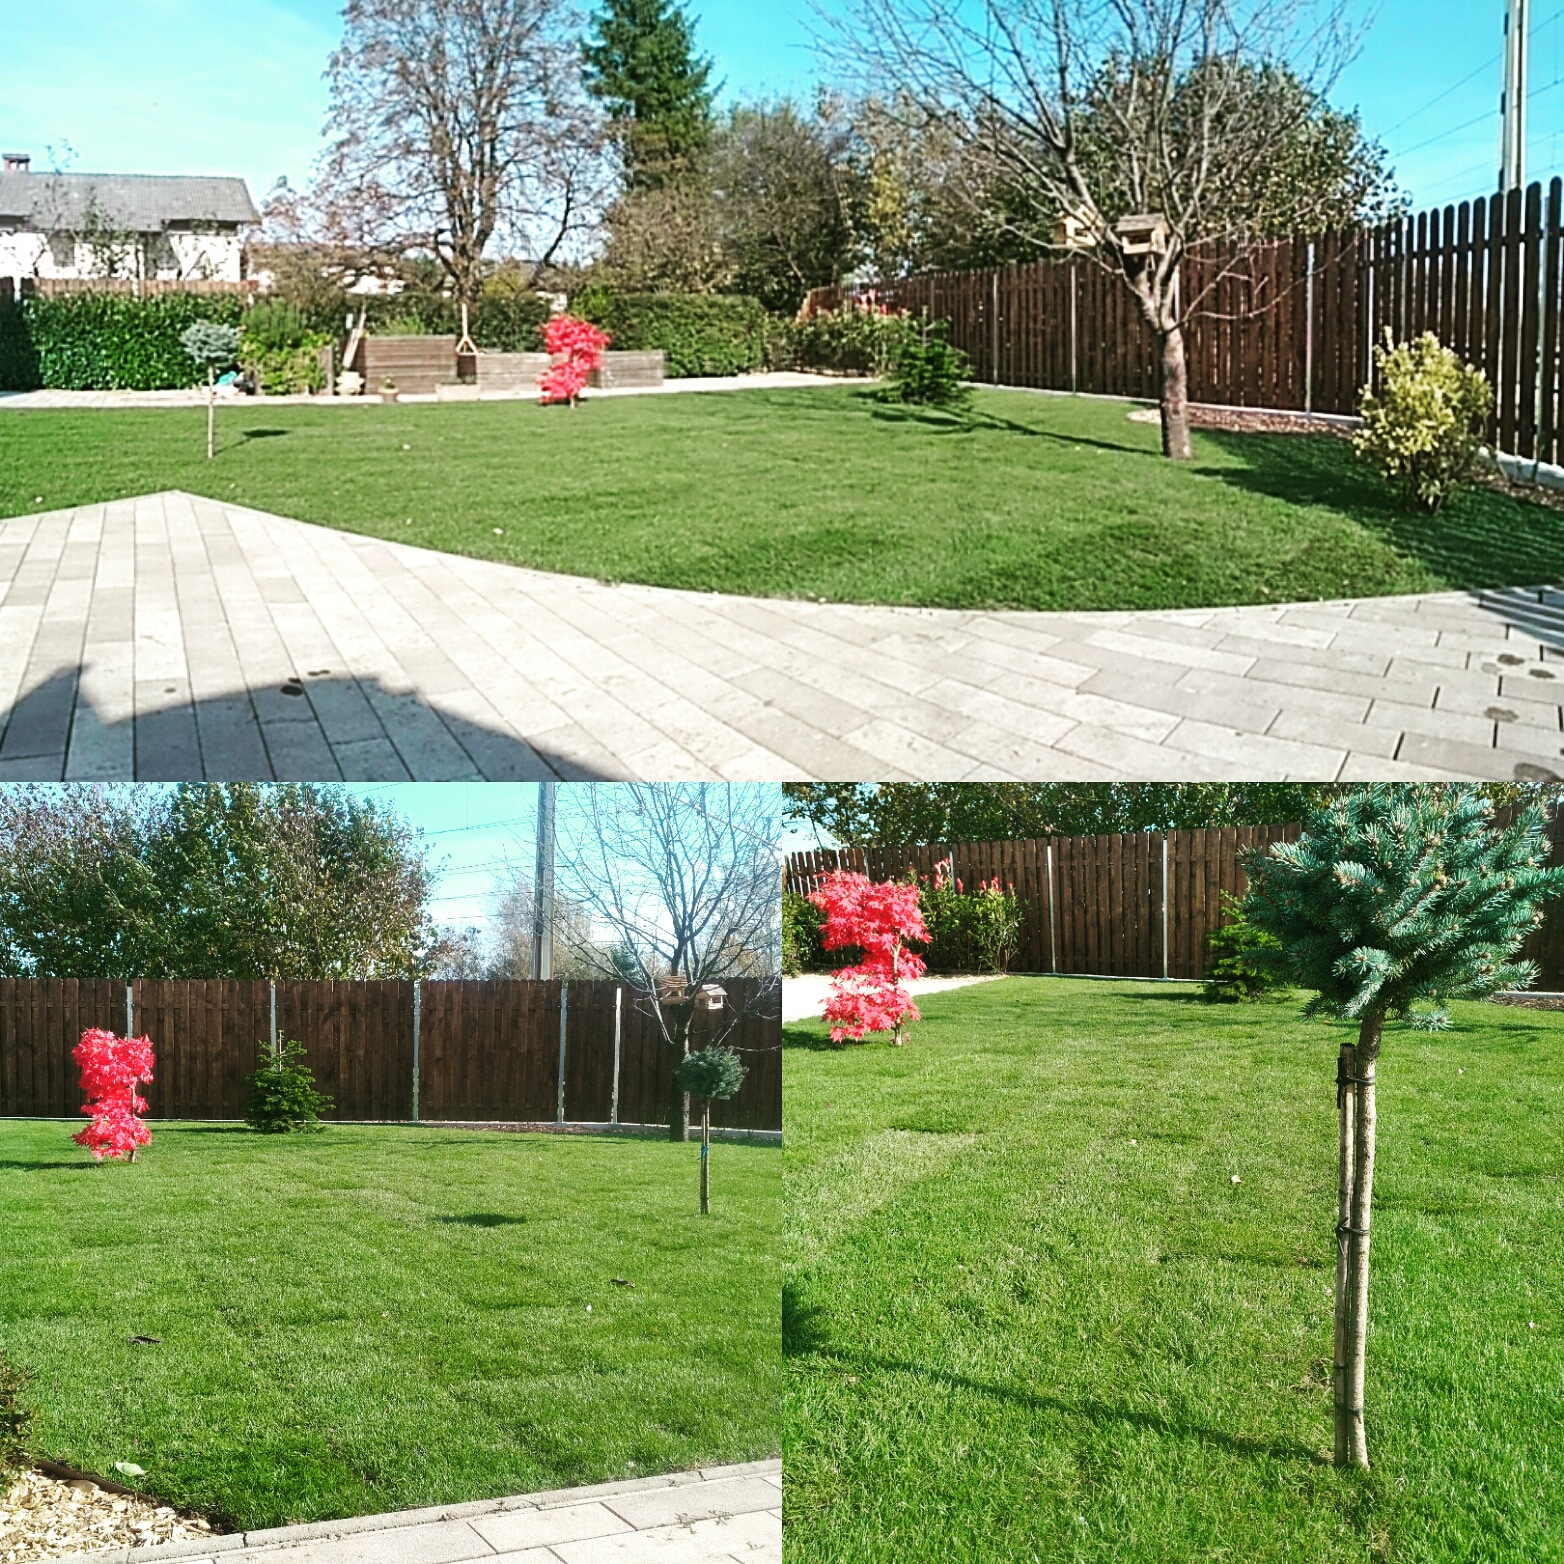 Urejanje okolice, travni tepihi